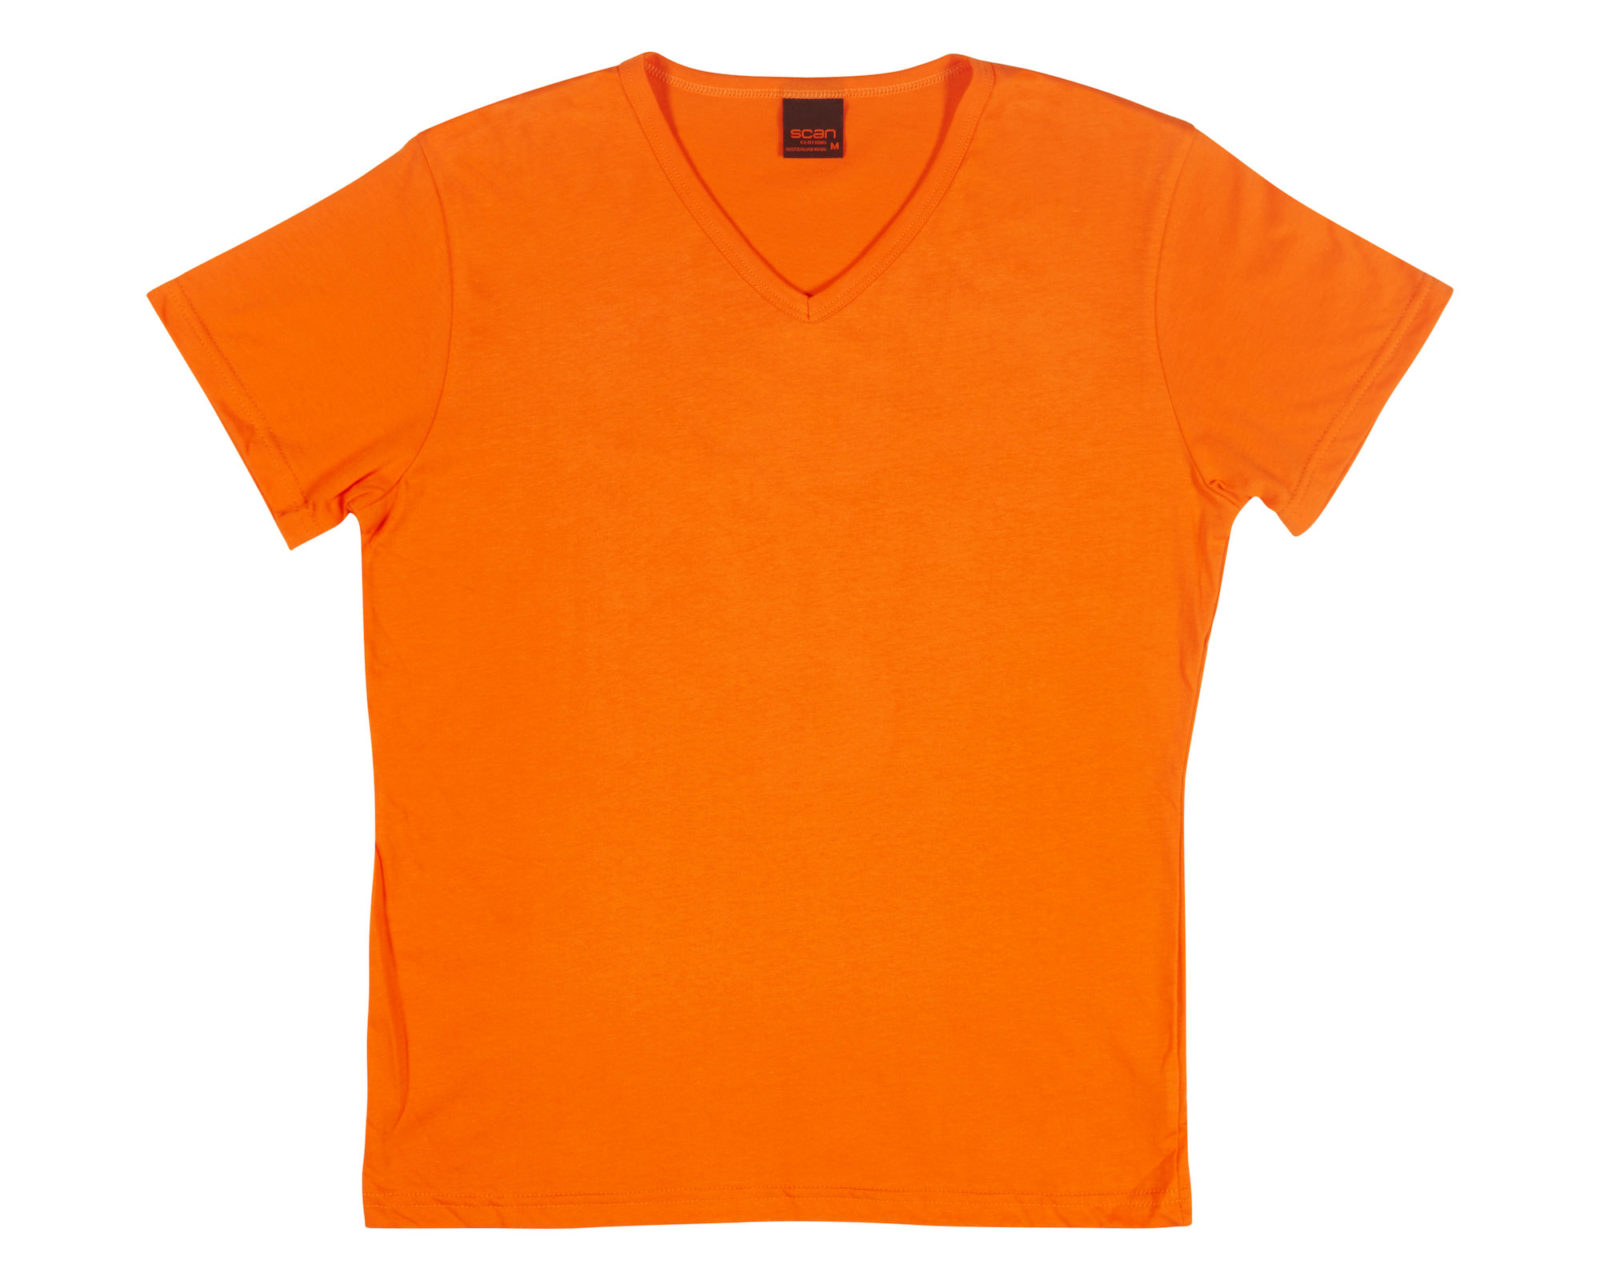 Custom made men 39 s clothing t shirts polo shirts for Custom made tee shirts